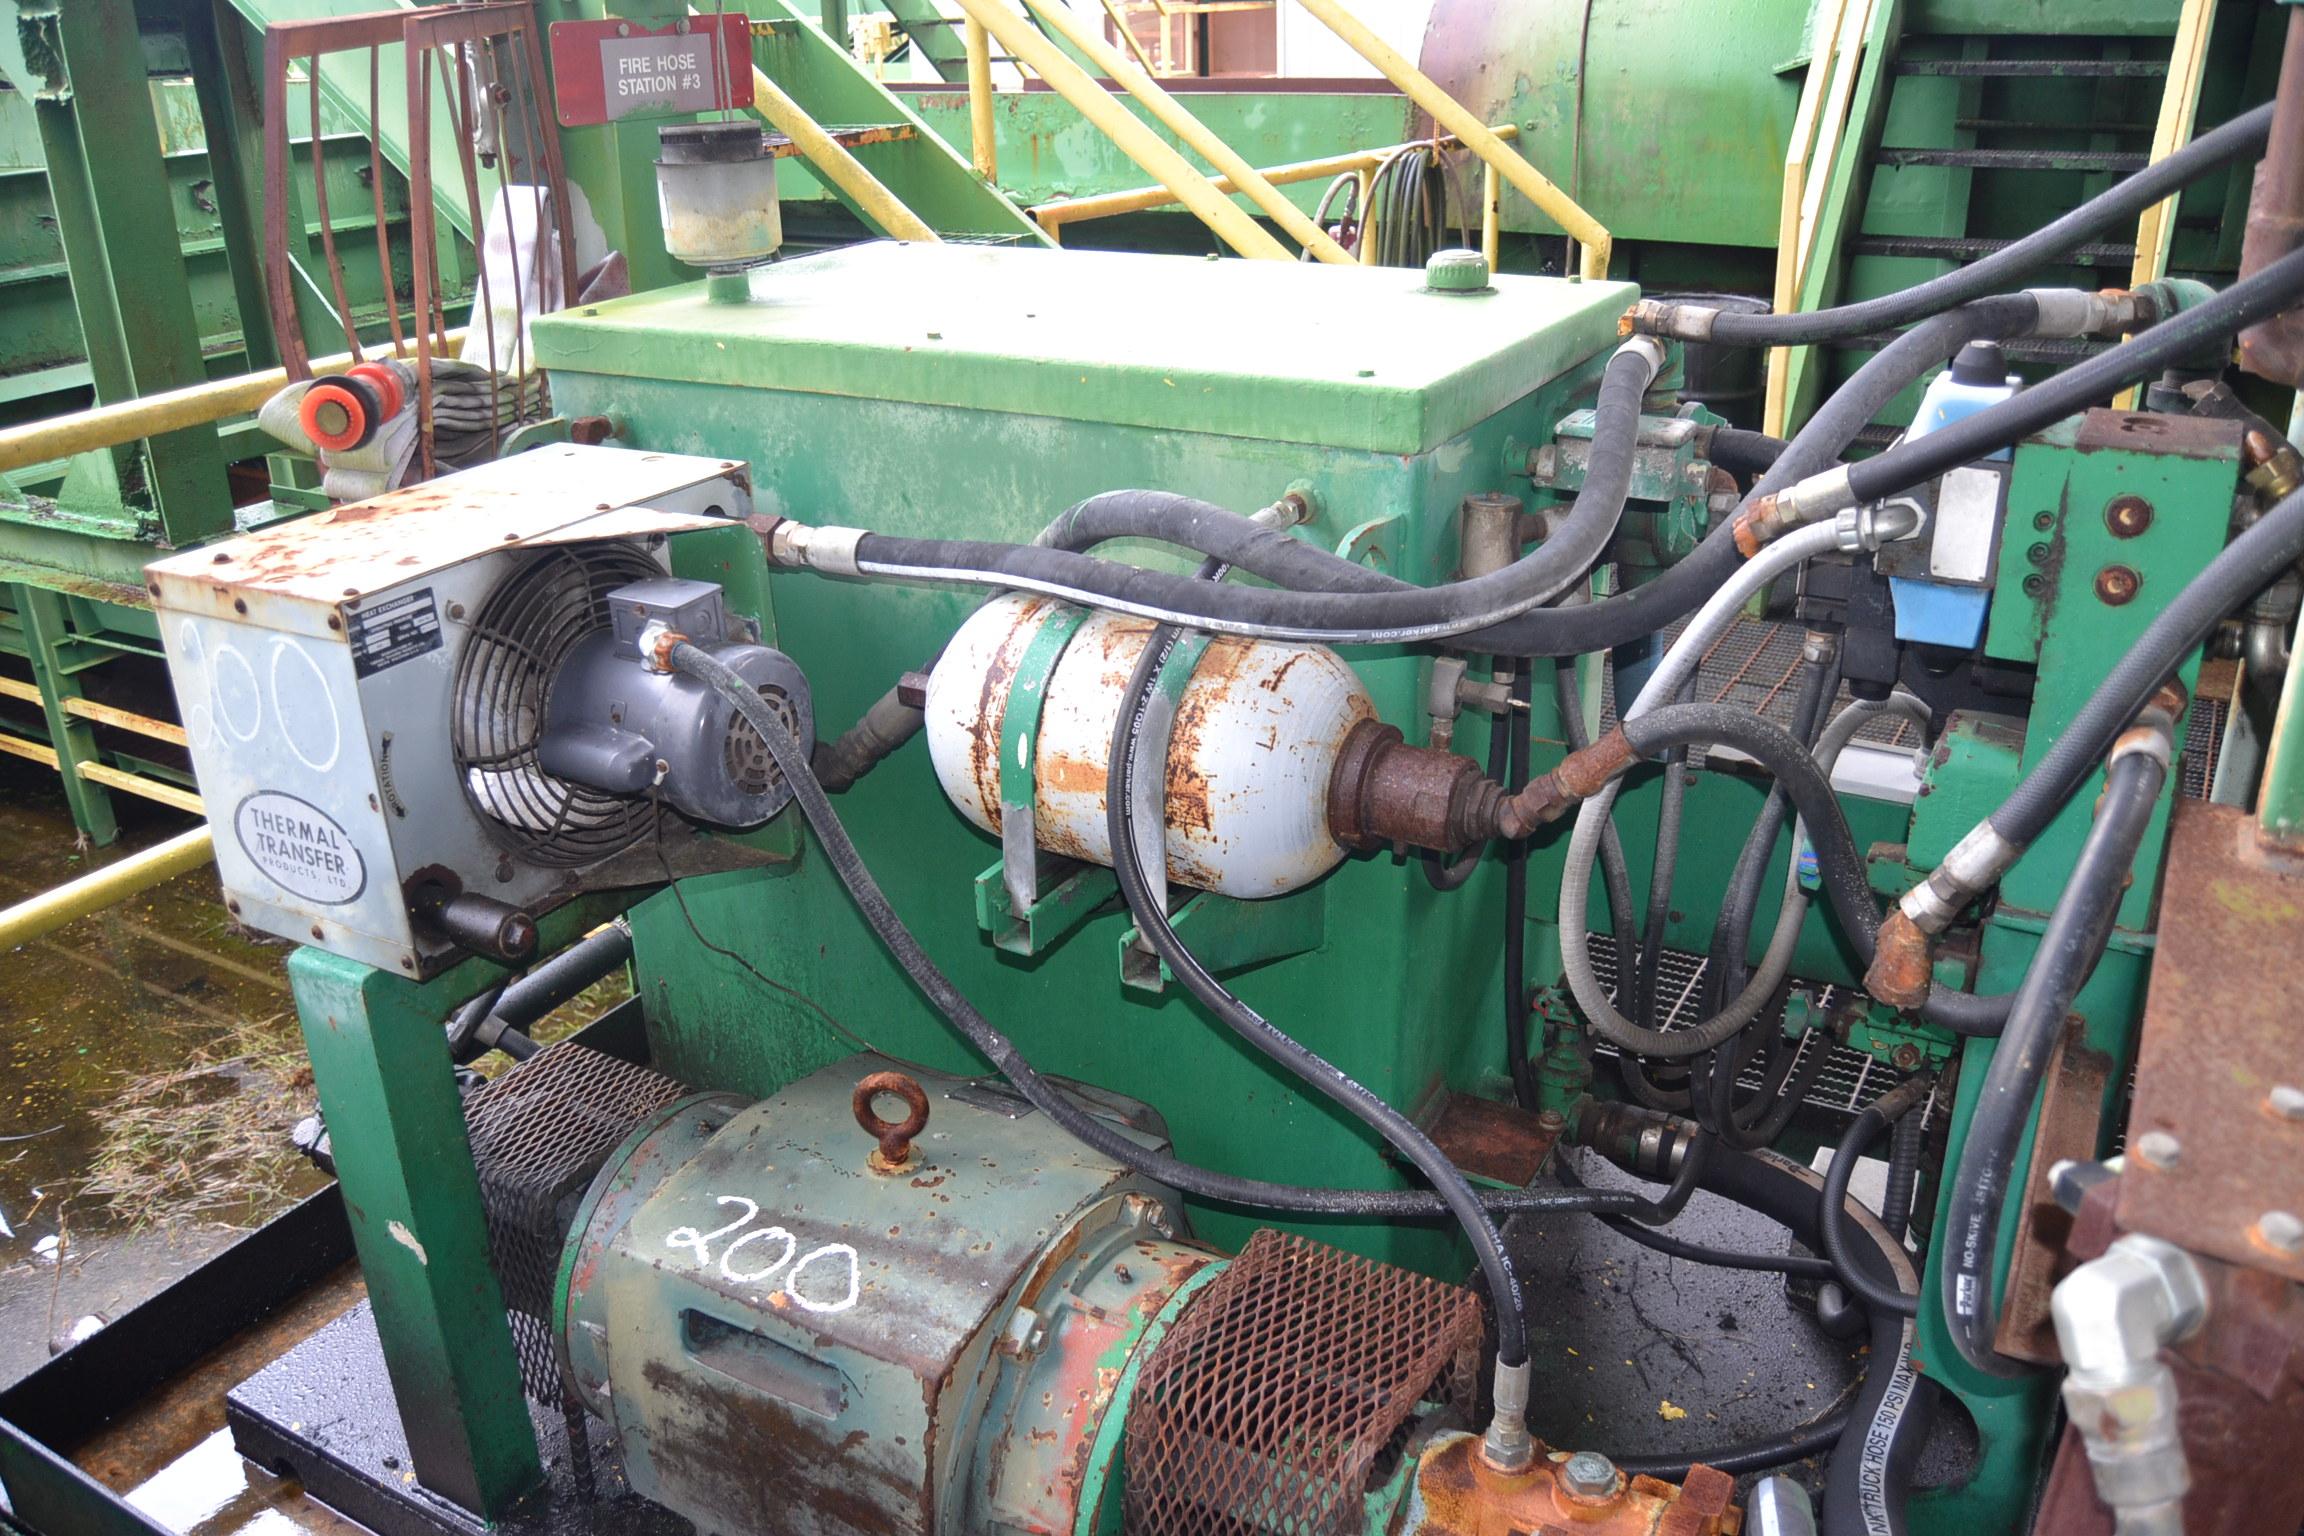 "Lot 200 - NICHOLSON A2 35"" RING DEBARKER W/MOTOR & CONTROLS; W/40 HP HYDRAULIC POWER PACK"